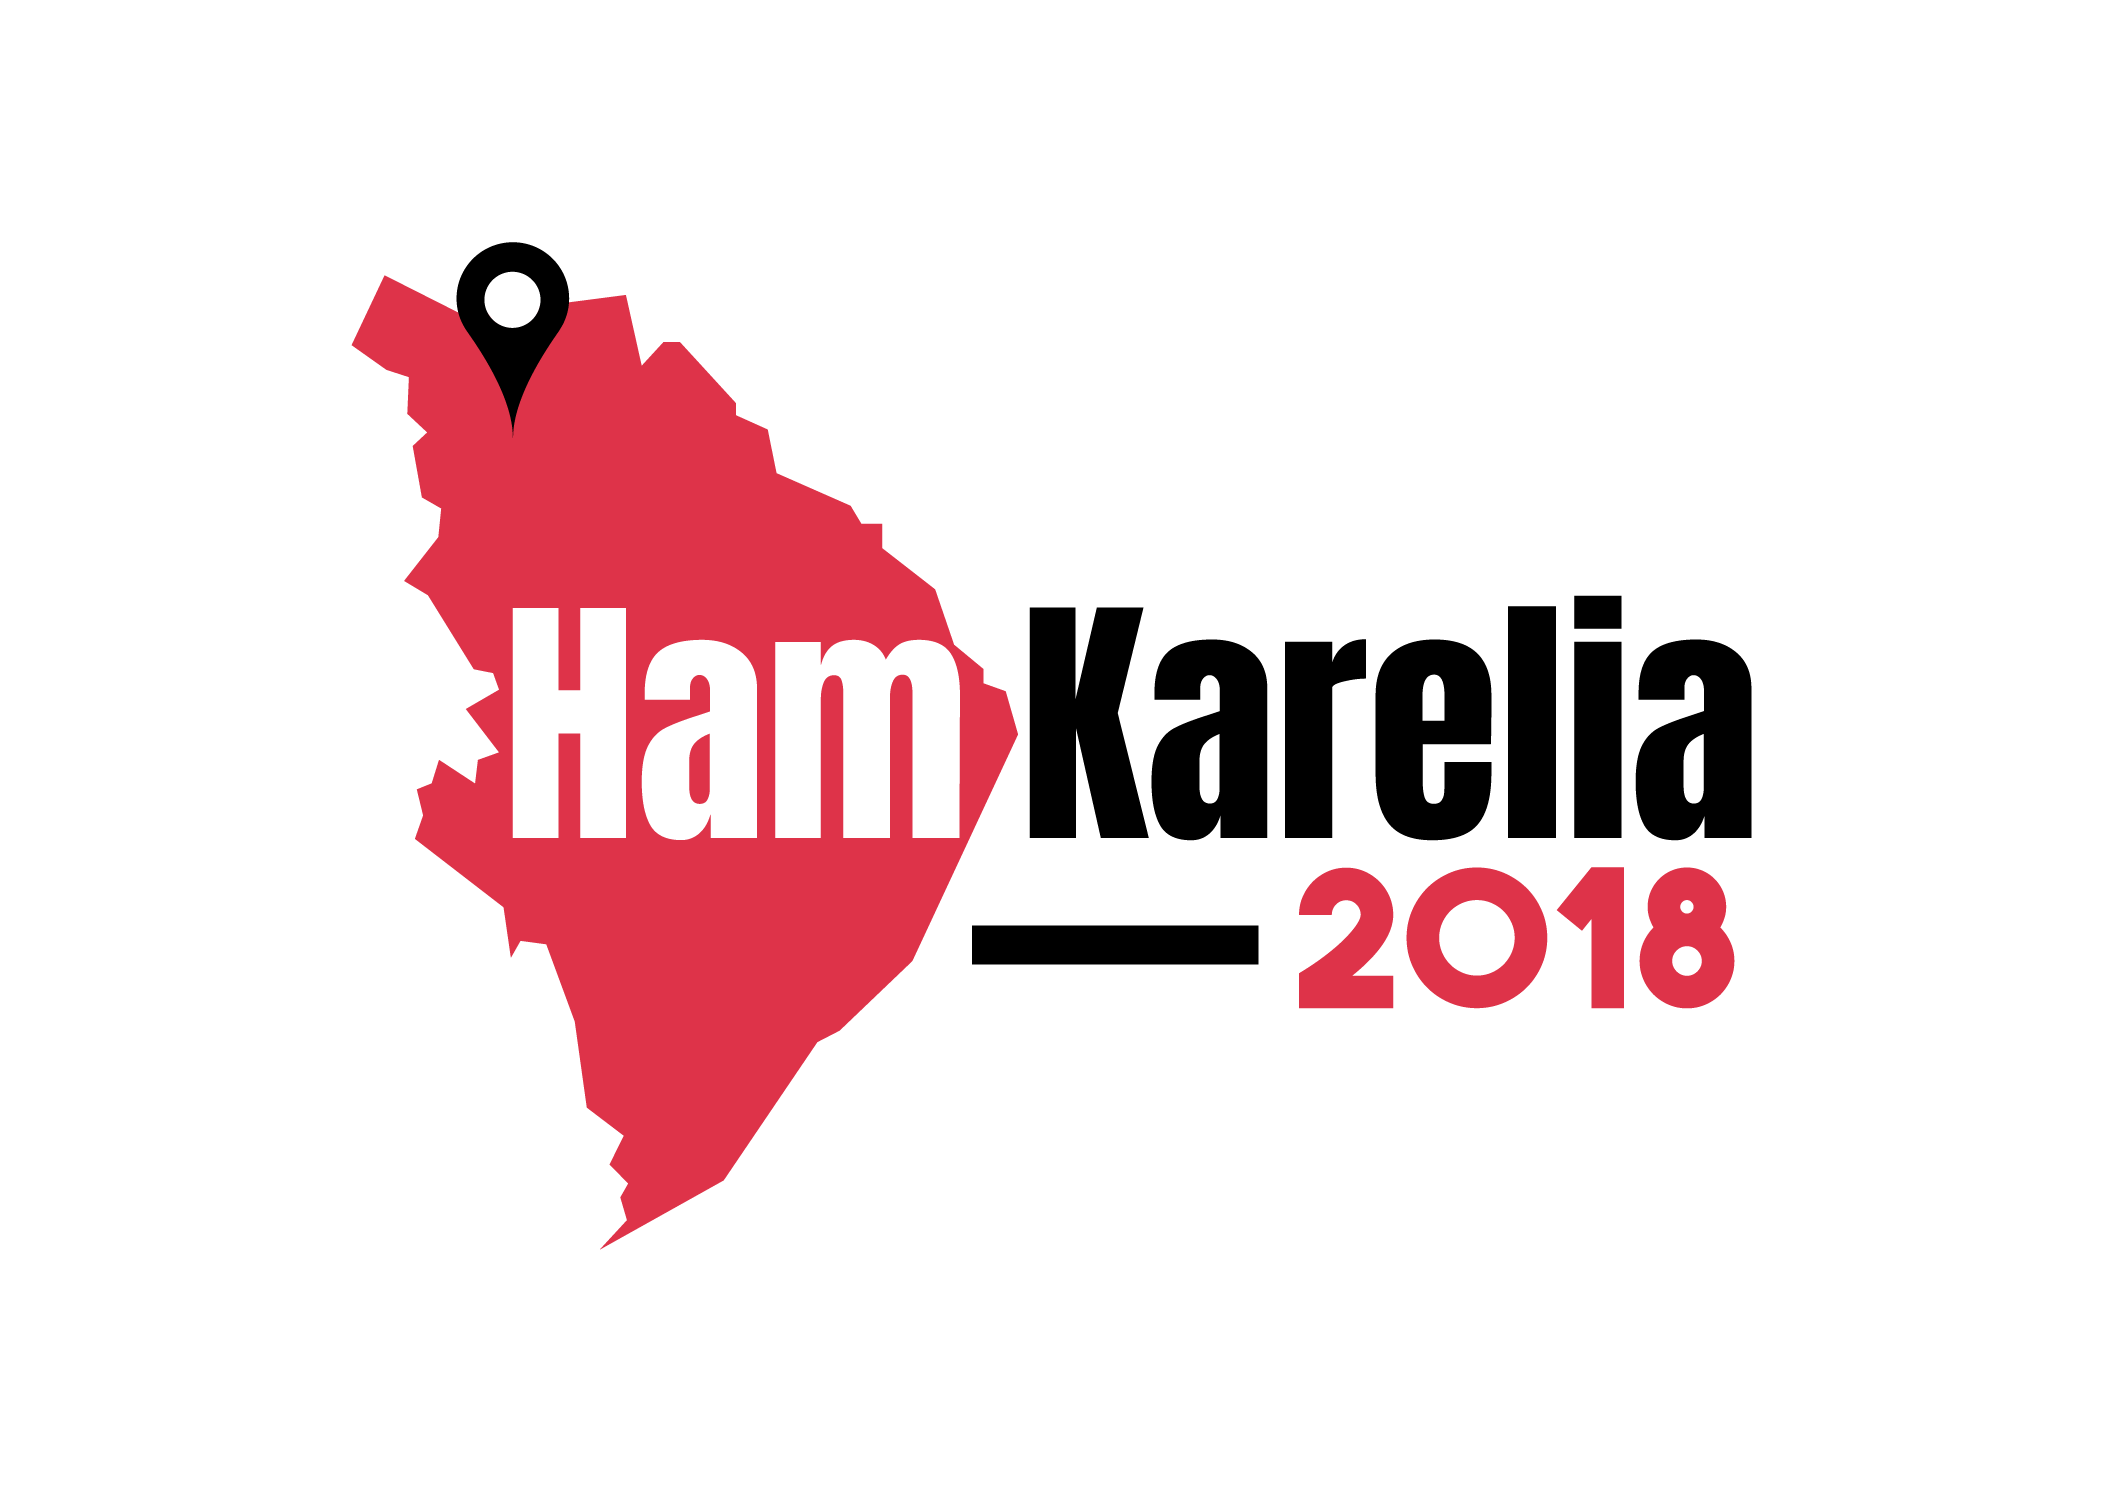 Ham Karelia 2018 – leiriesitelmiä